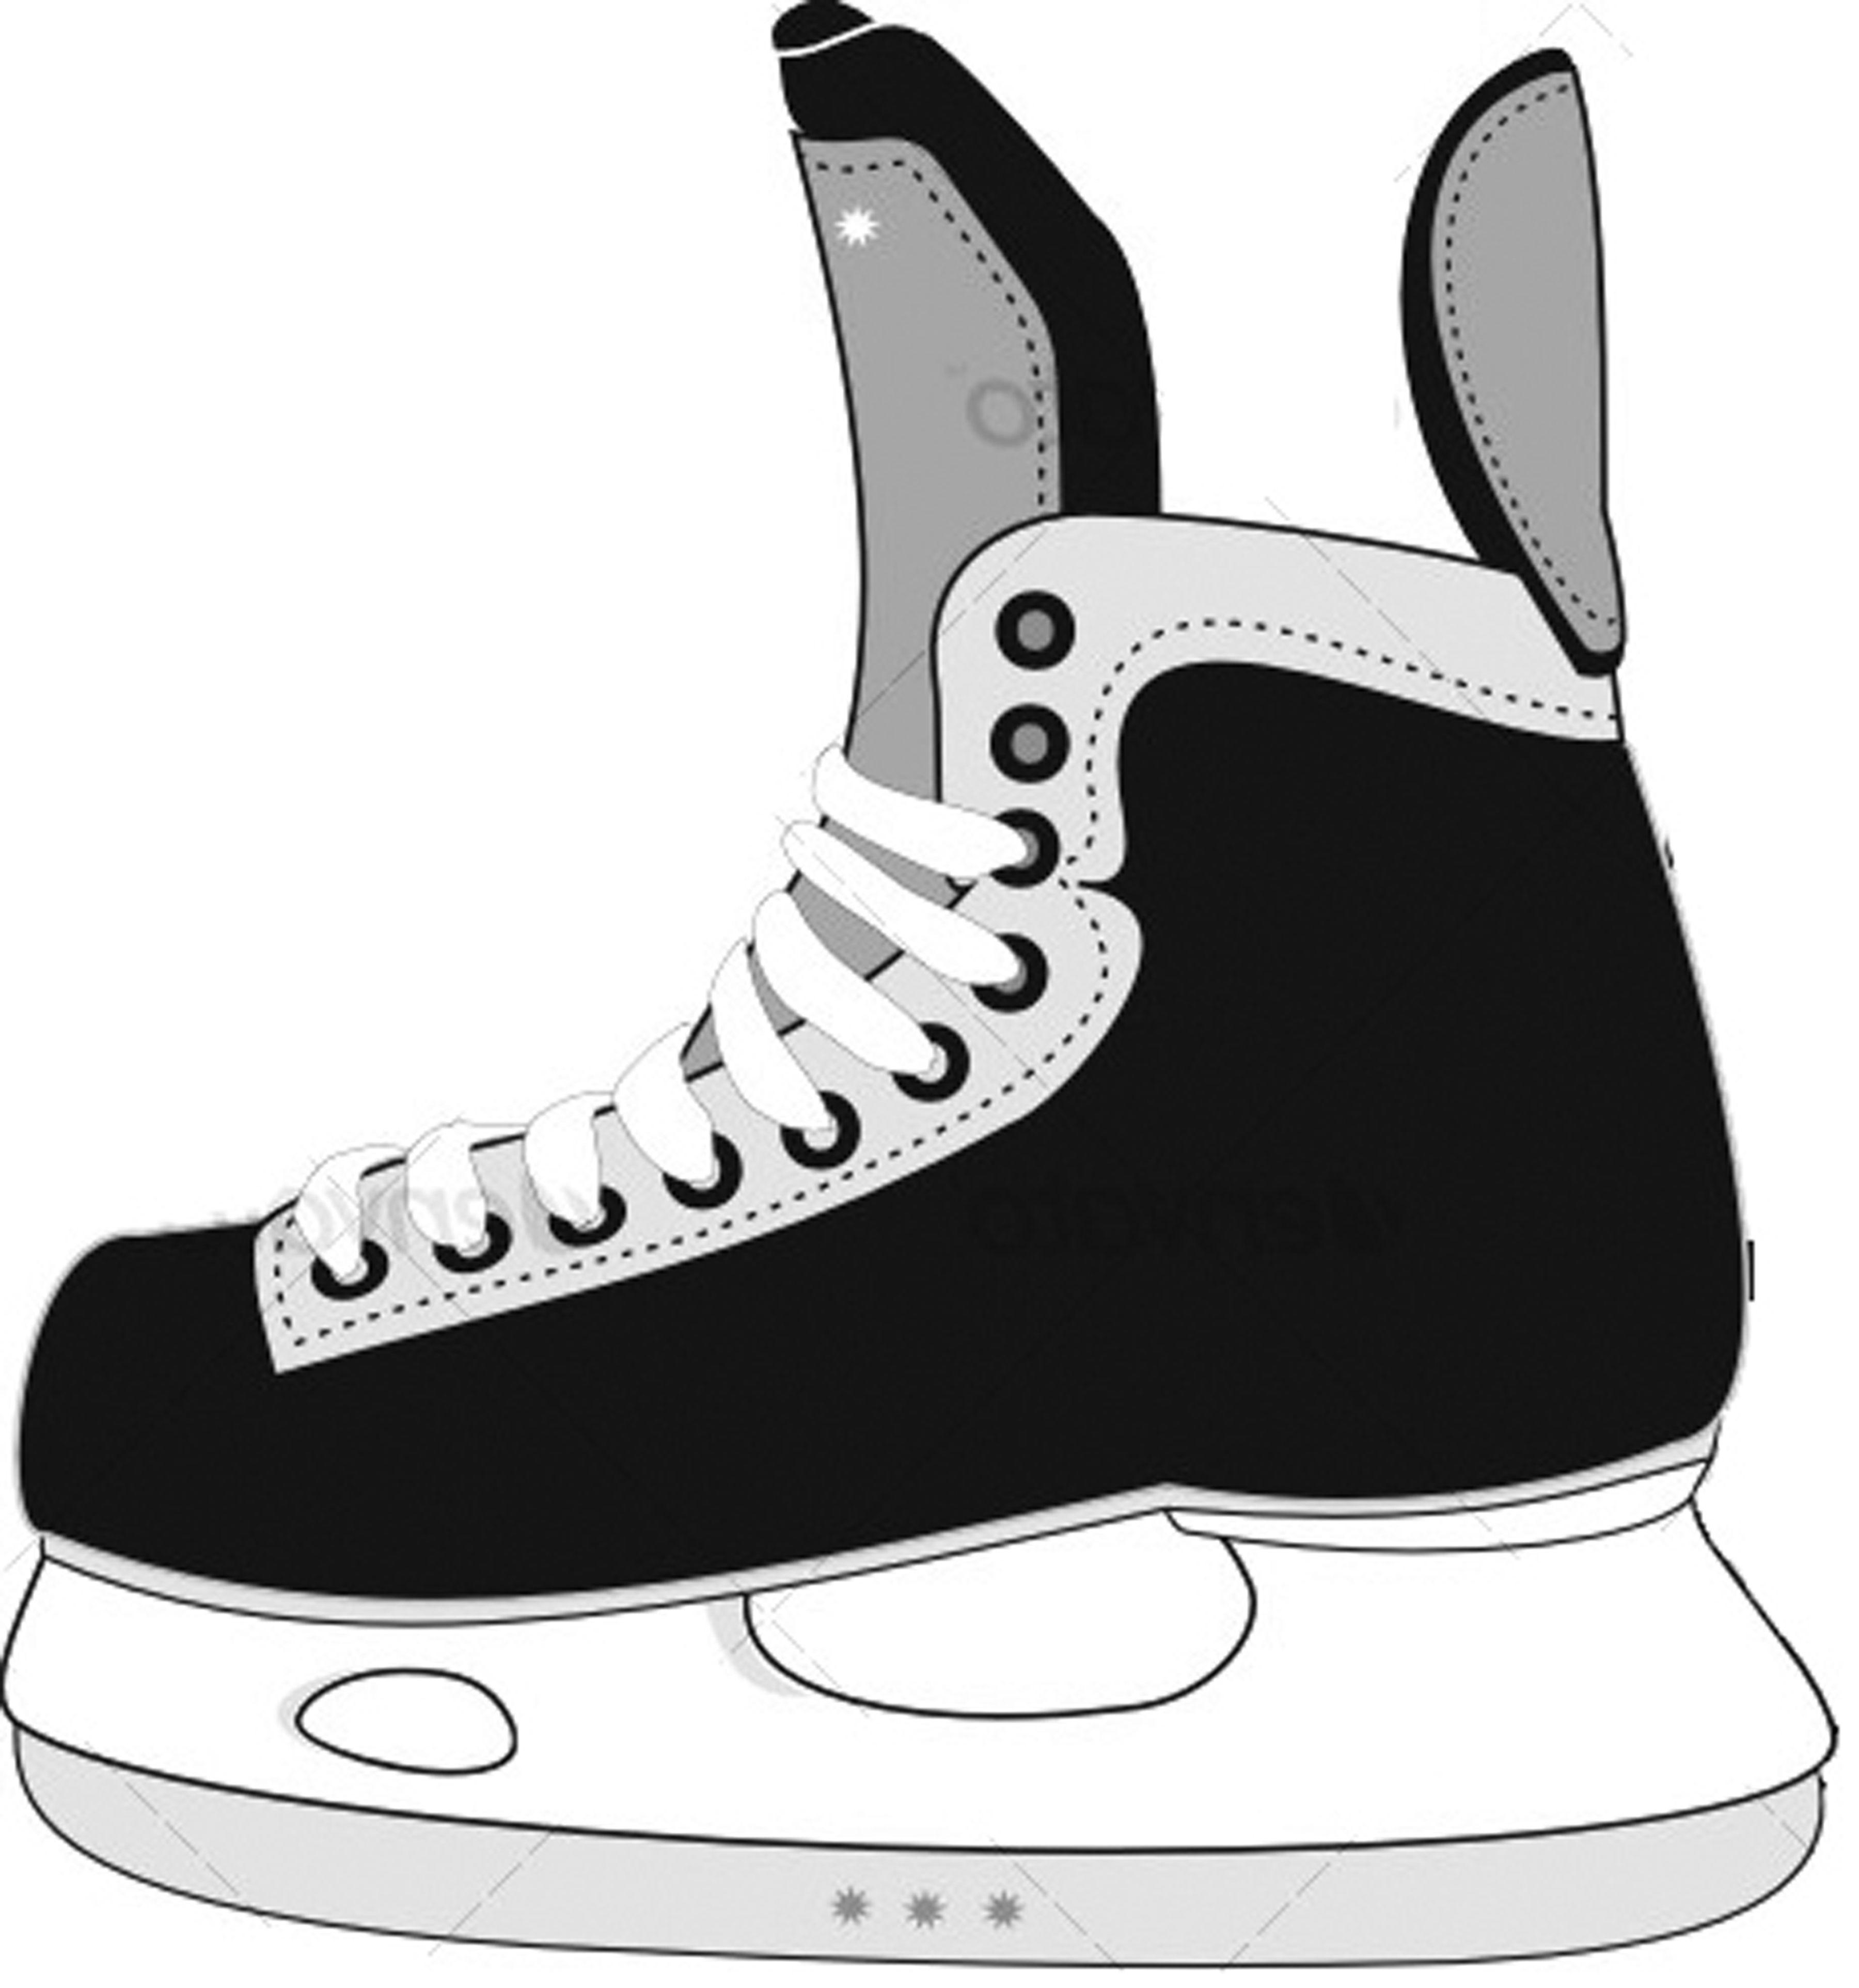 Image Result For Hockey Skate Template Free Printable